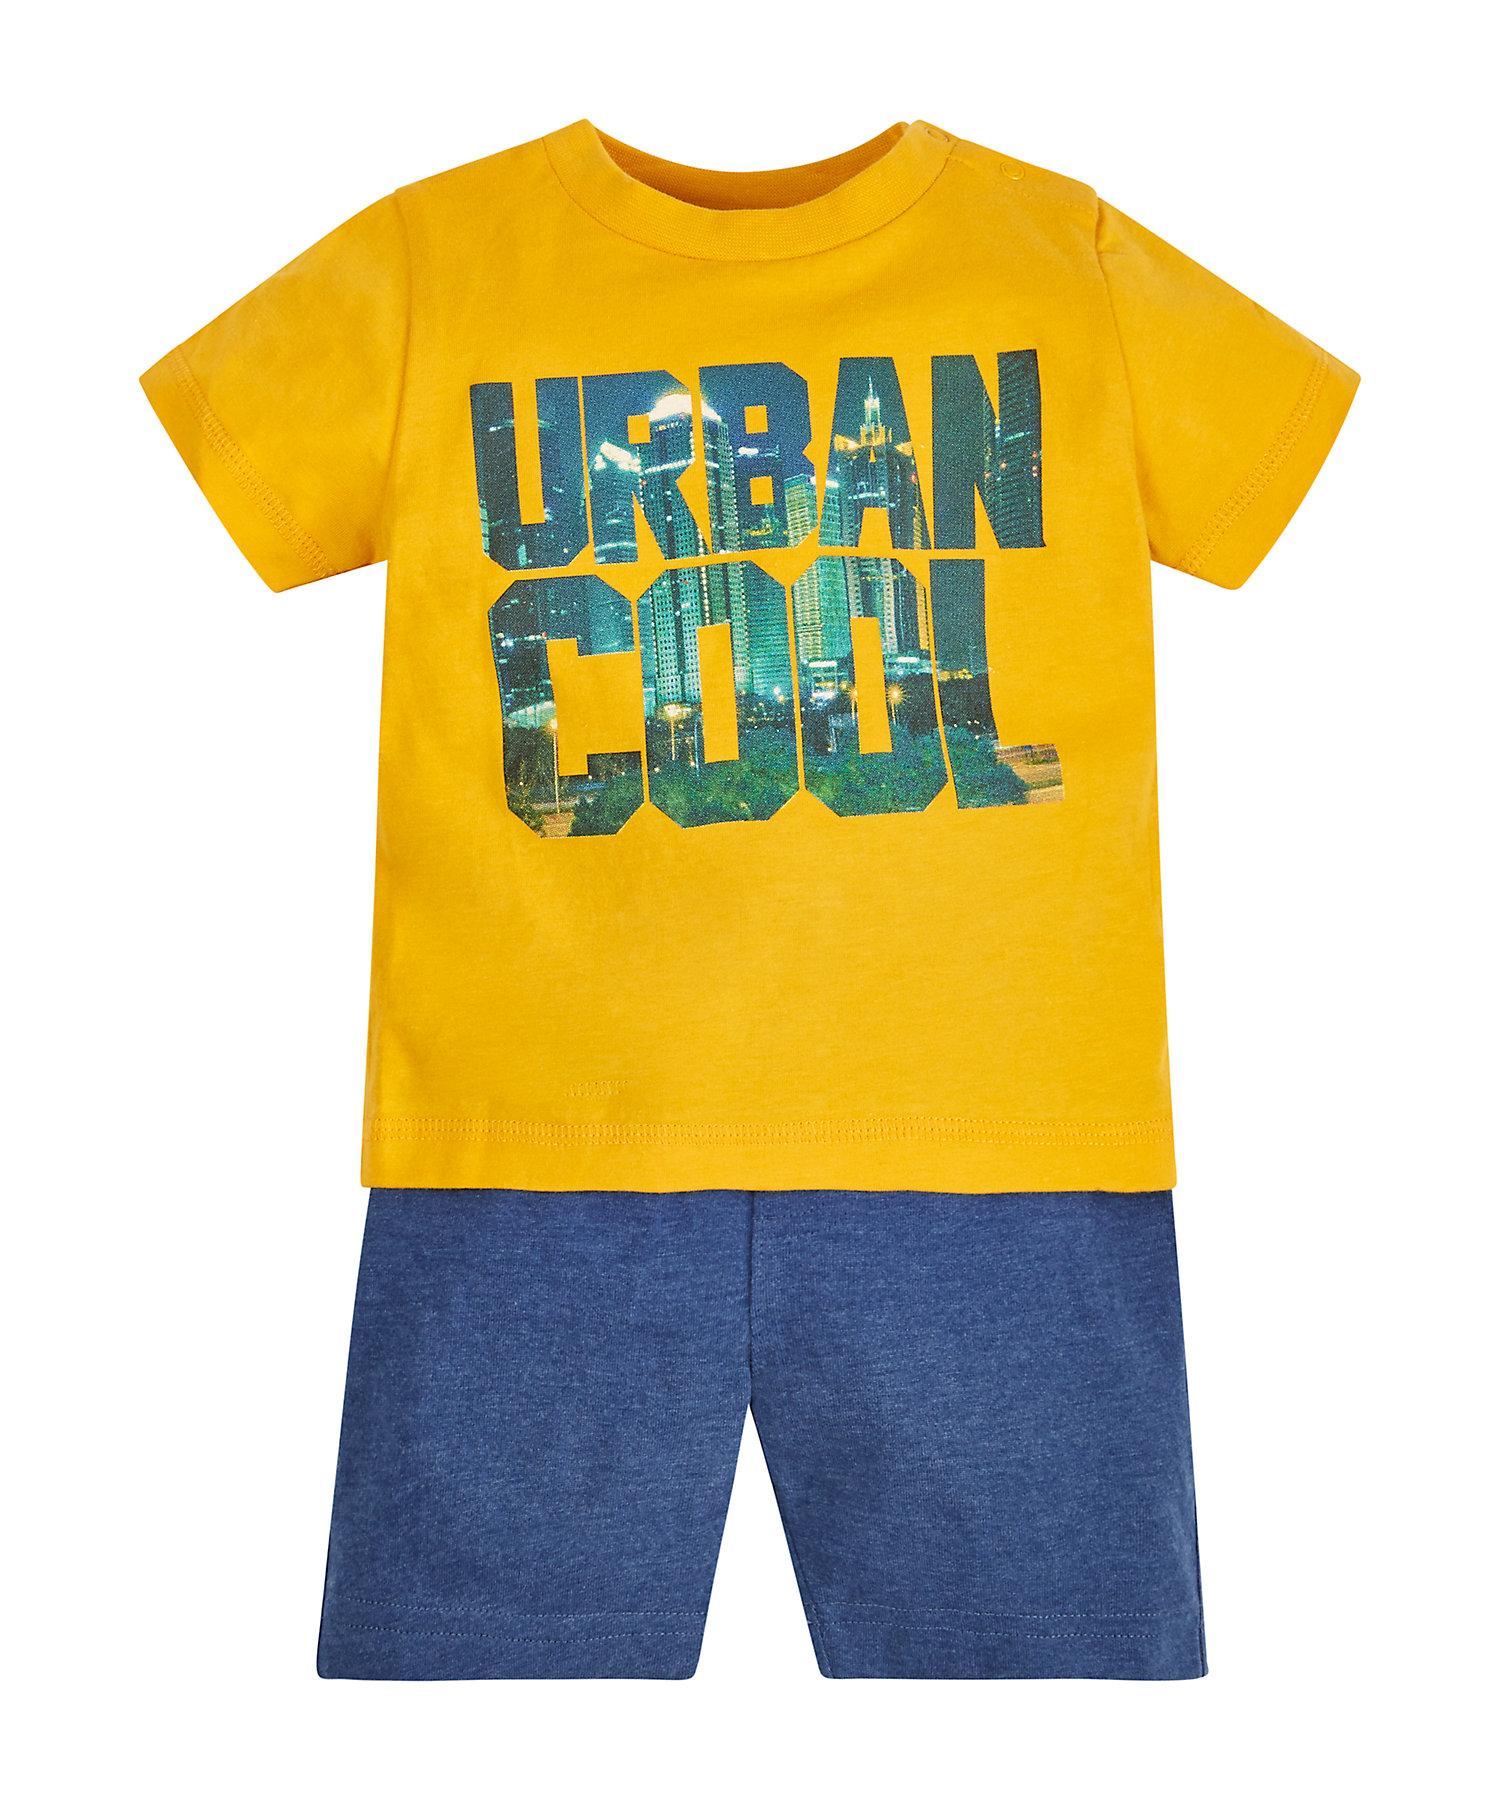 Mothercare | Boys Half Sleeves T-Shirt And Shorts Set Text Print - Pack Of 2 - Yellow